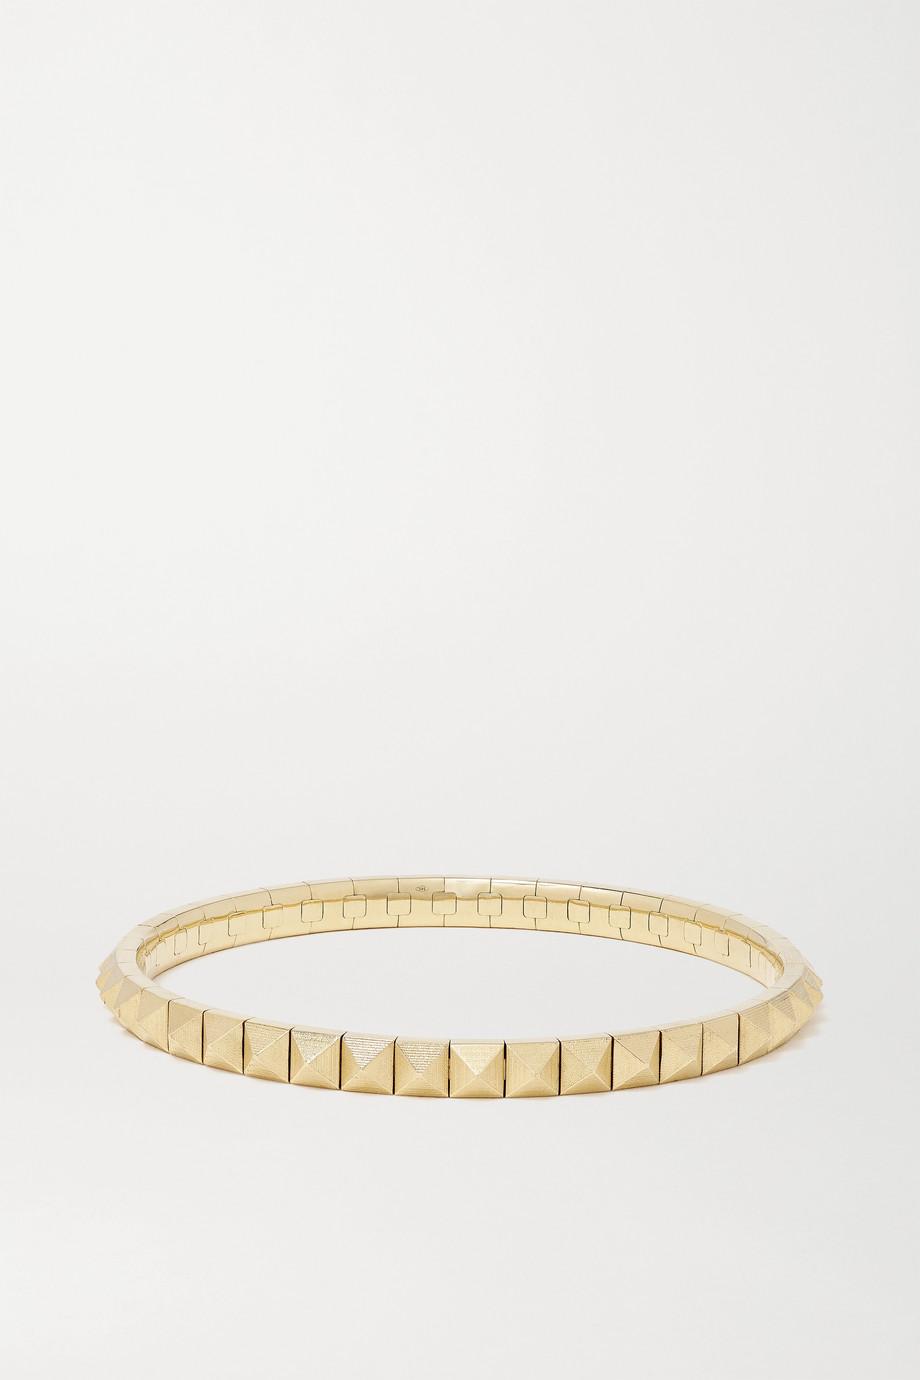 Jacquie Aiche Spike 14-karat gold bracelet